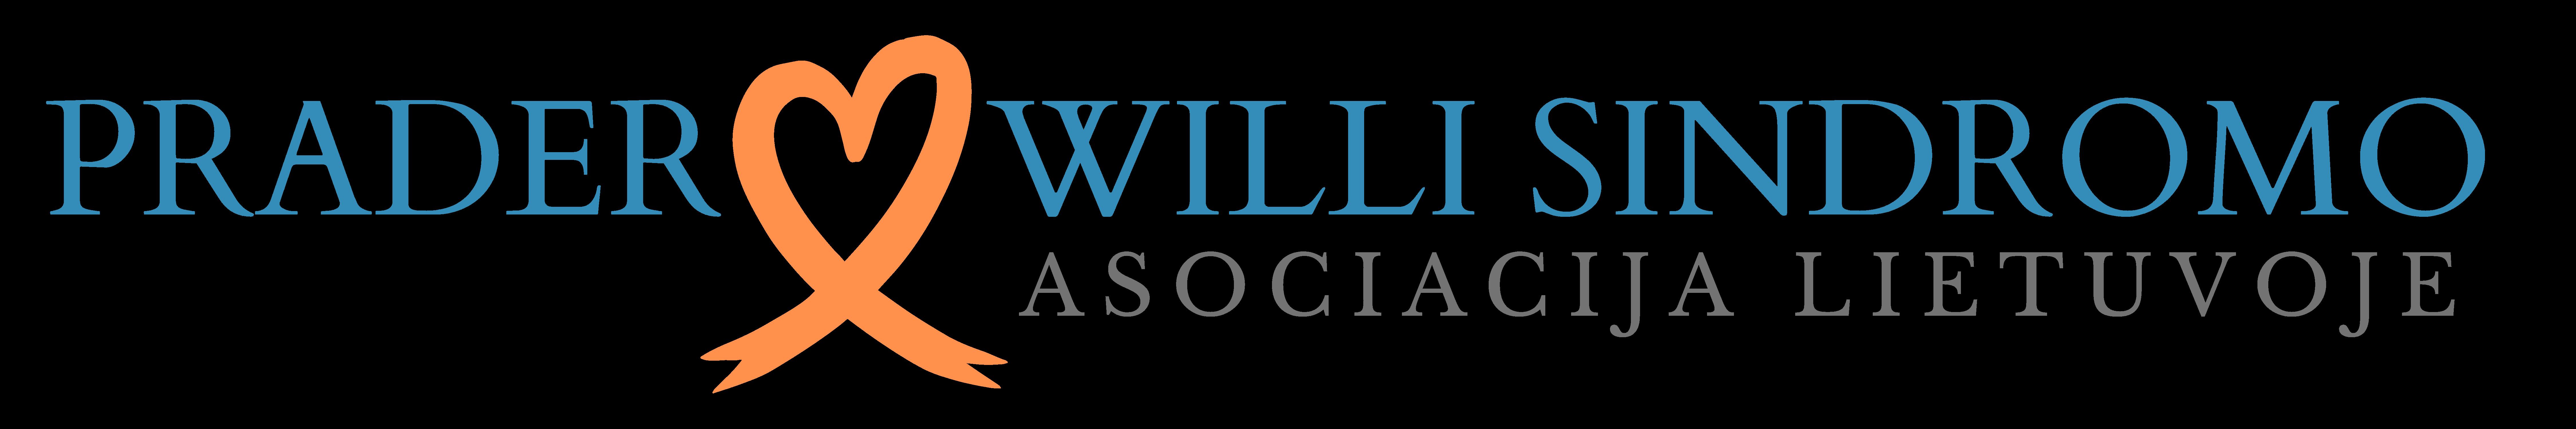 Prader-Willi sindromo asociacija Lietuvoje